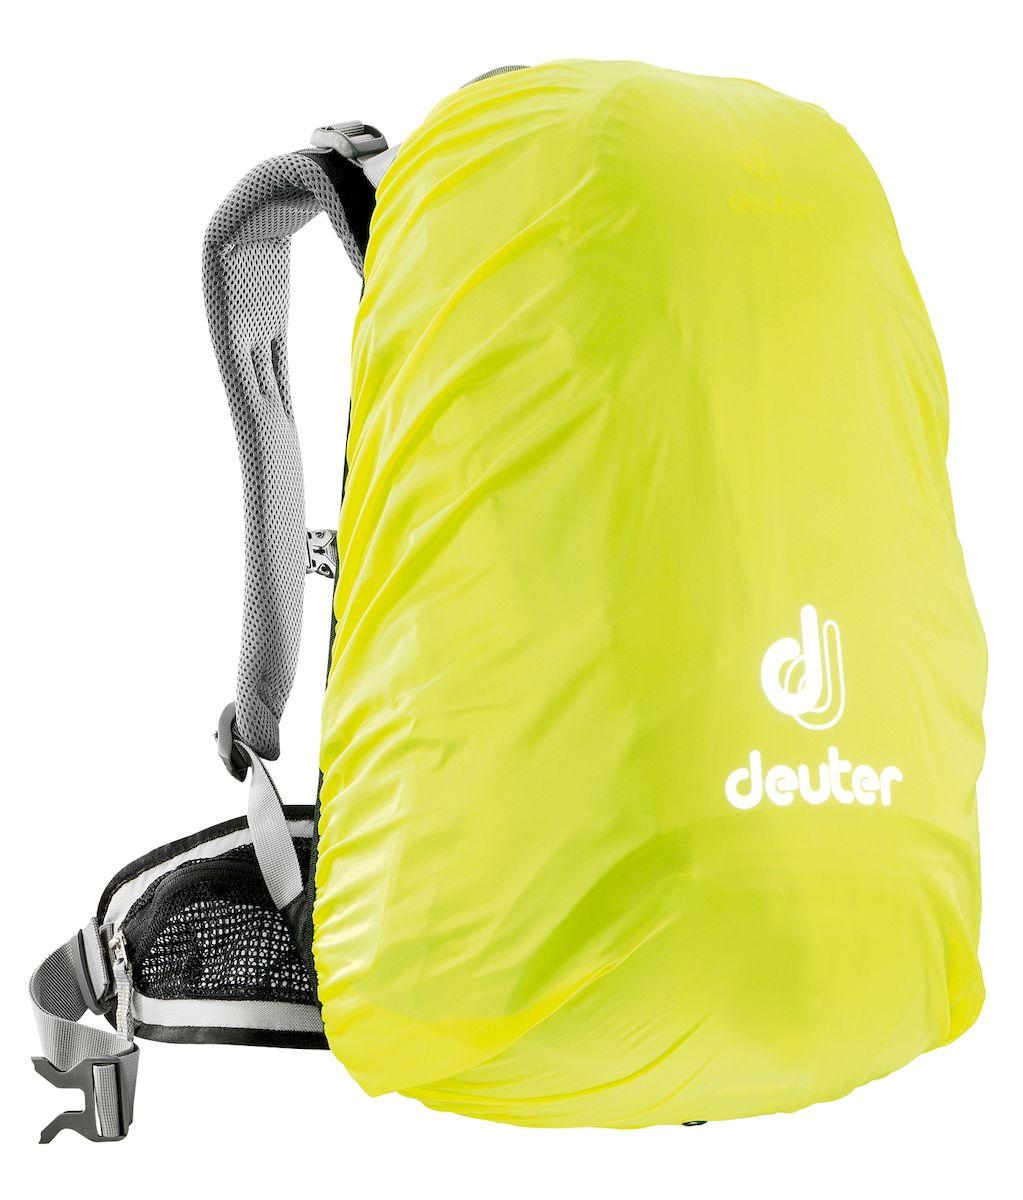 Чехол для рюкзака Deuter  Raincover Square , от дождя, цвет: желтый, 20-32 л - Туристические рюкзаки